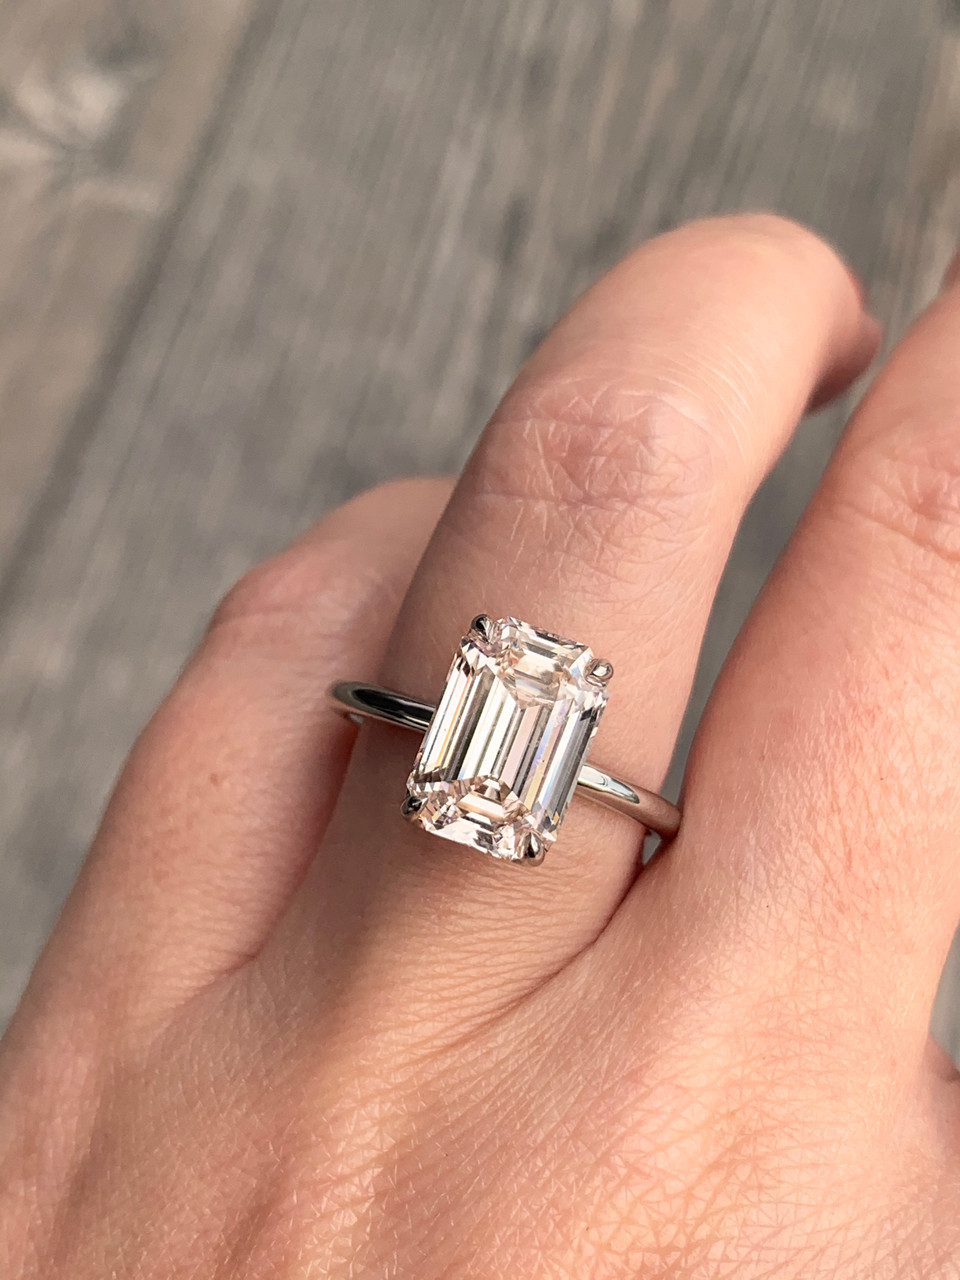 Frank darling custom 5 carat diamond ring set in platinum with an emerald cut diamond